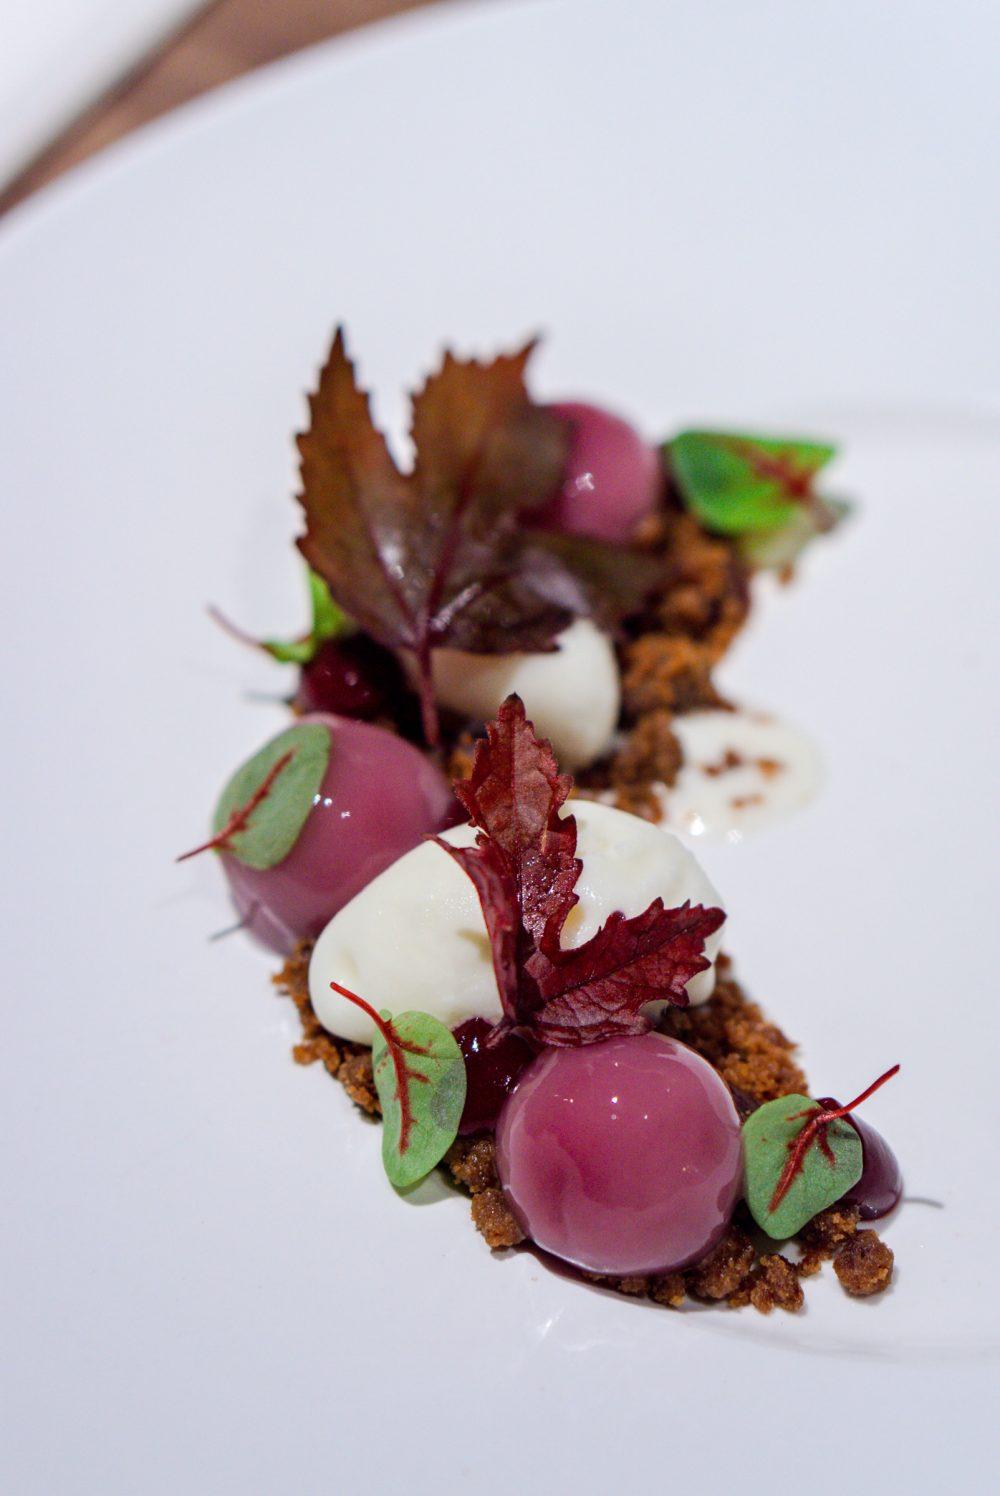 Restaurant-Ibid-Woo-Wai-Leong-Hibiscus-Dessert-2-1000x1496.jpg